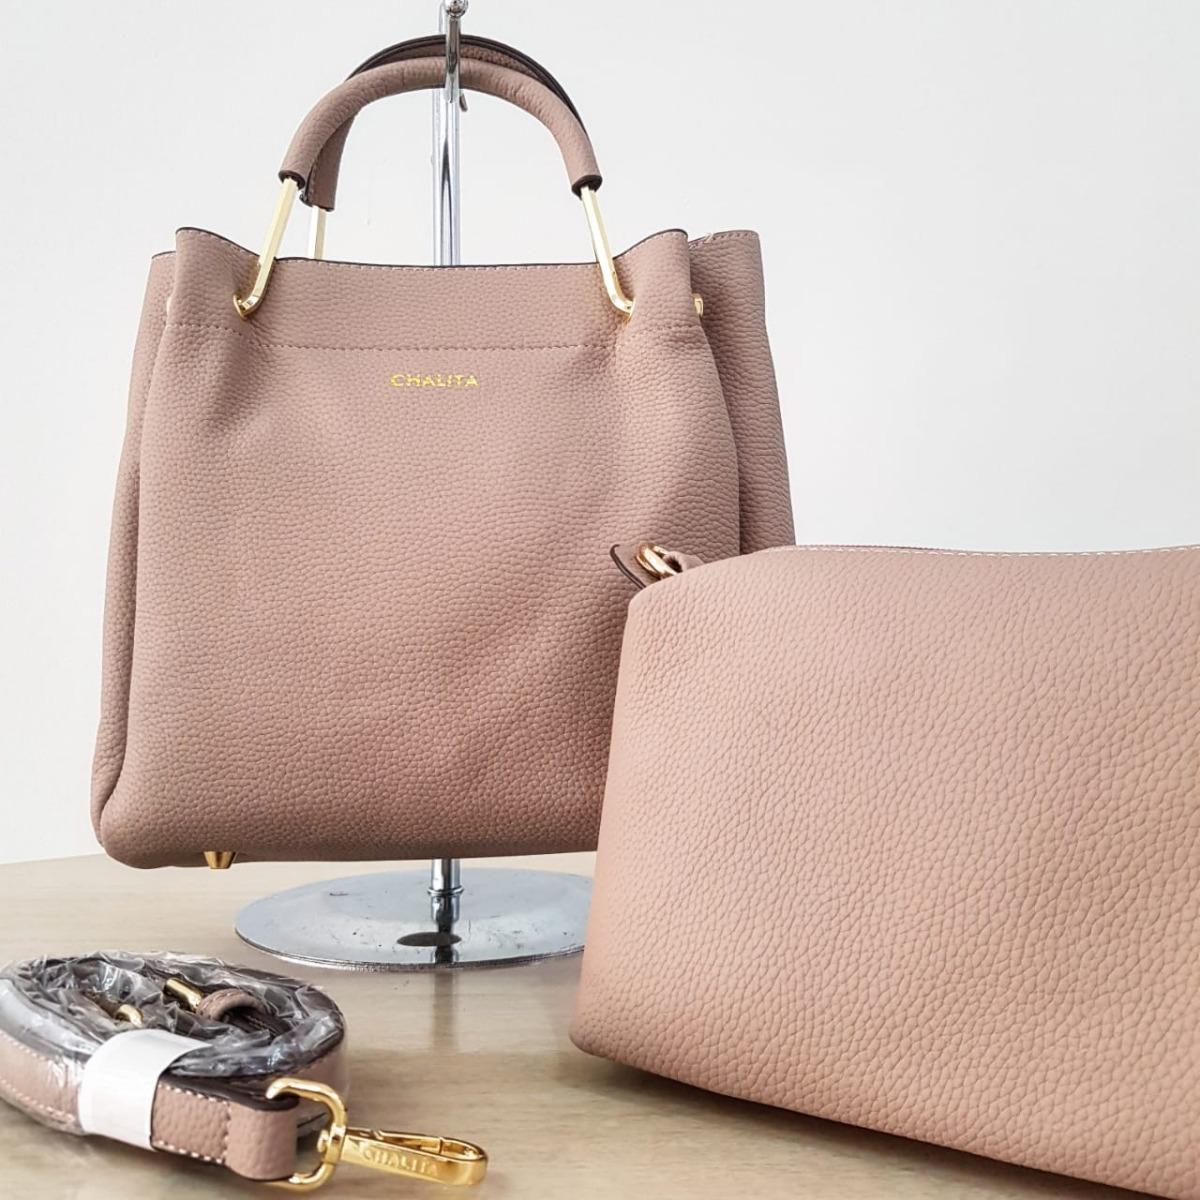 542f08b51 Bolsa Feminina Chalita Kit 2 Bolsas Luxo-ch0259 Barata - R$ 149,90 ...